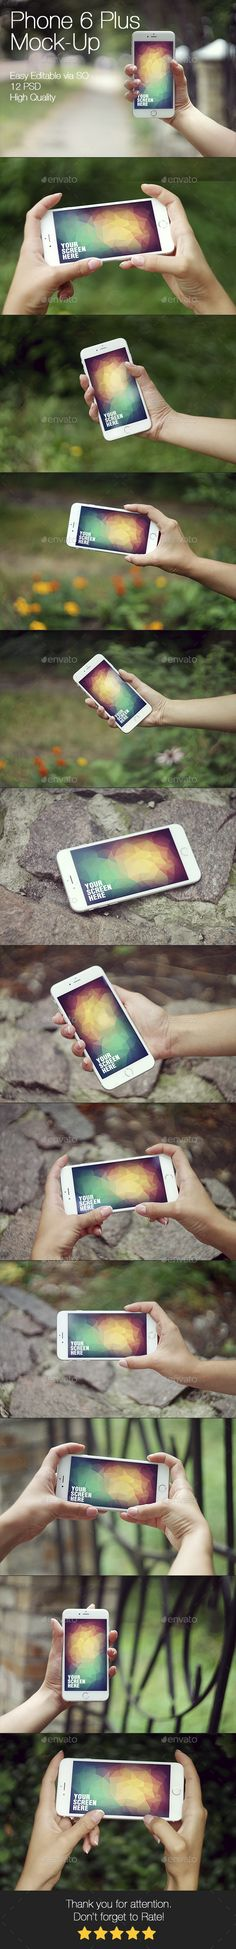 iPhone 6 Plus Mockup Template #mockup #design Download: http://graphicriver.net/item/phone-6-plus-mockup/12616987?ref=ksioks